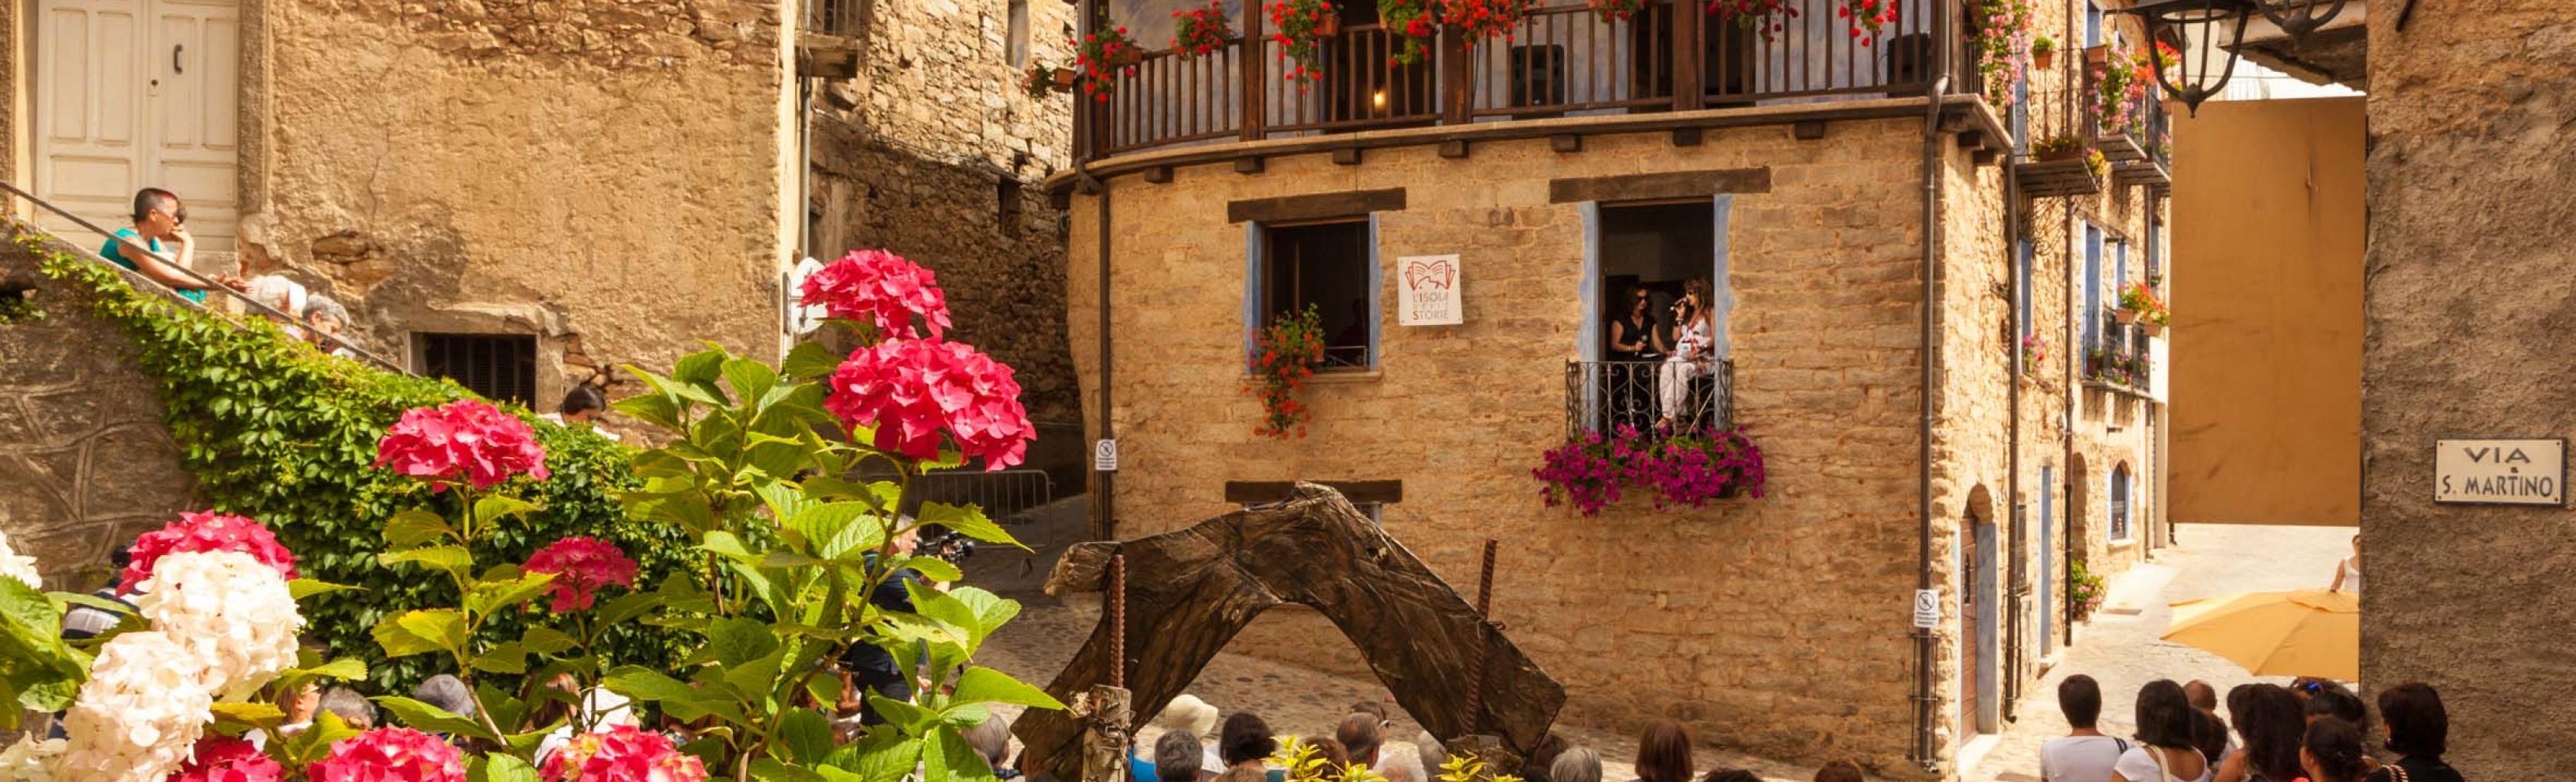 Gavoi - via San Martino